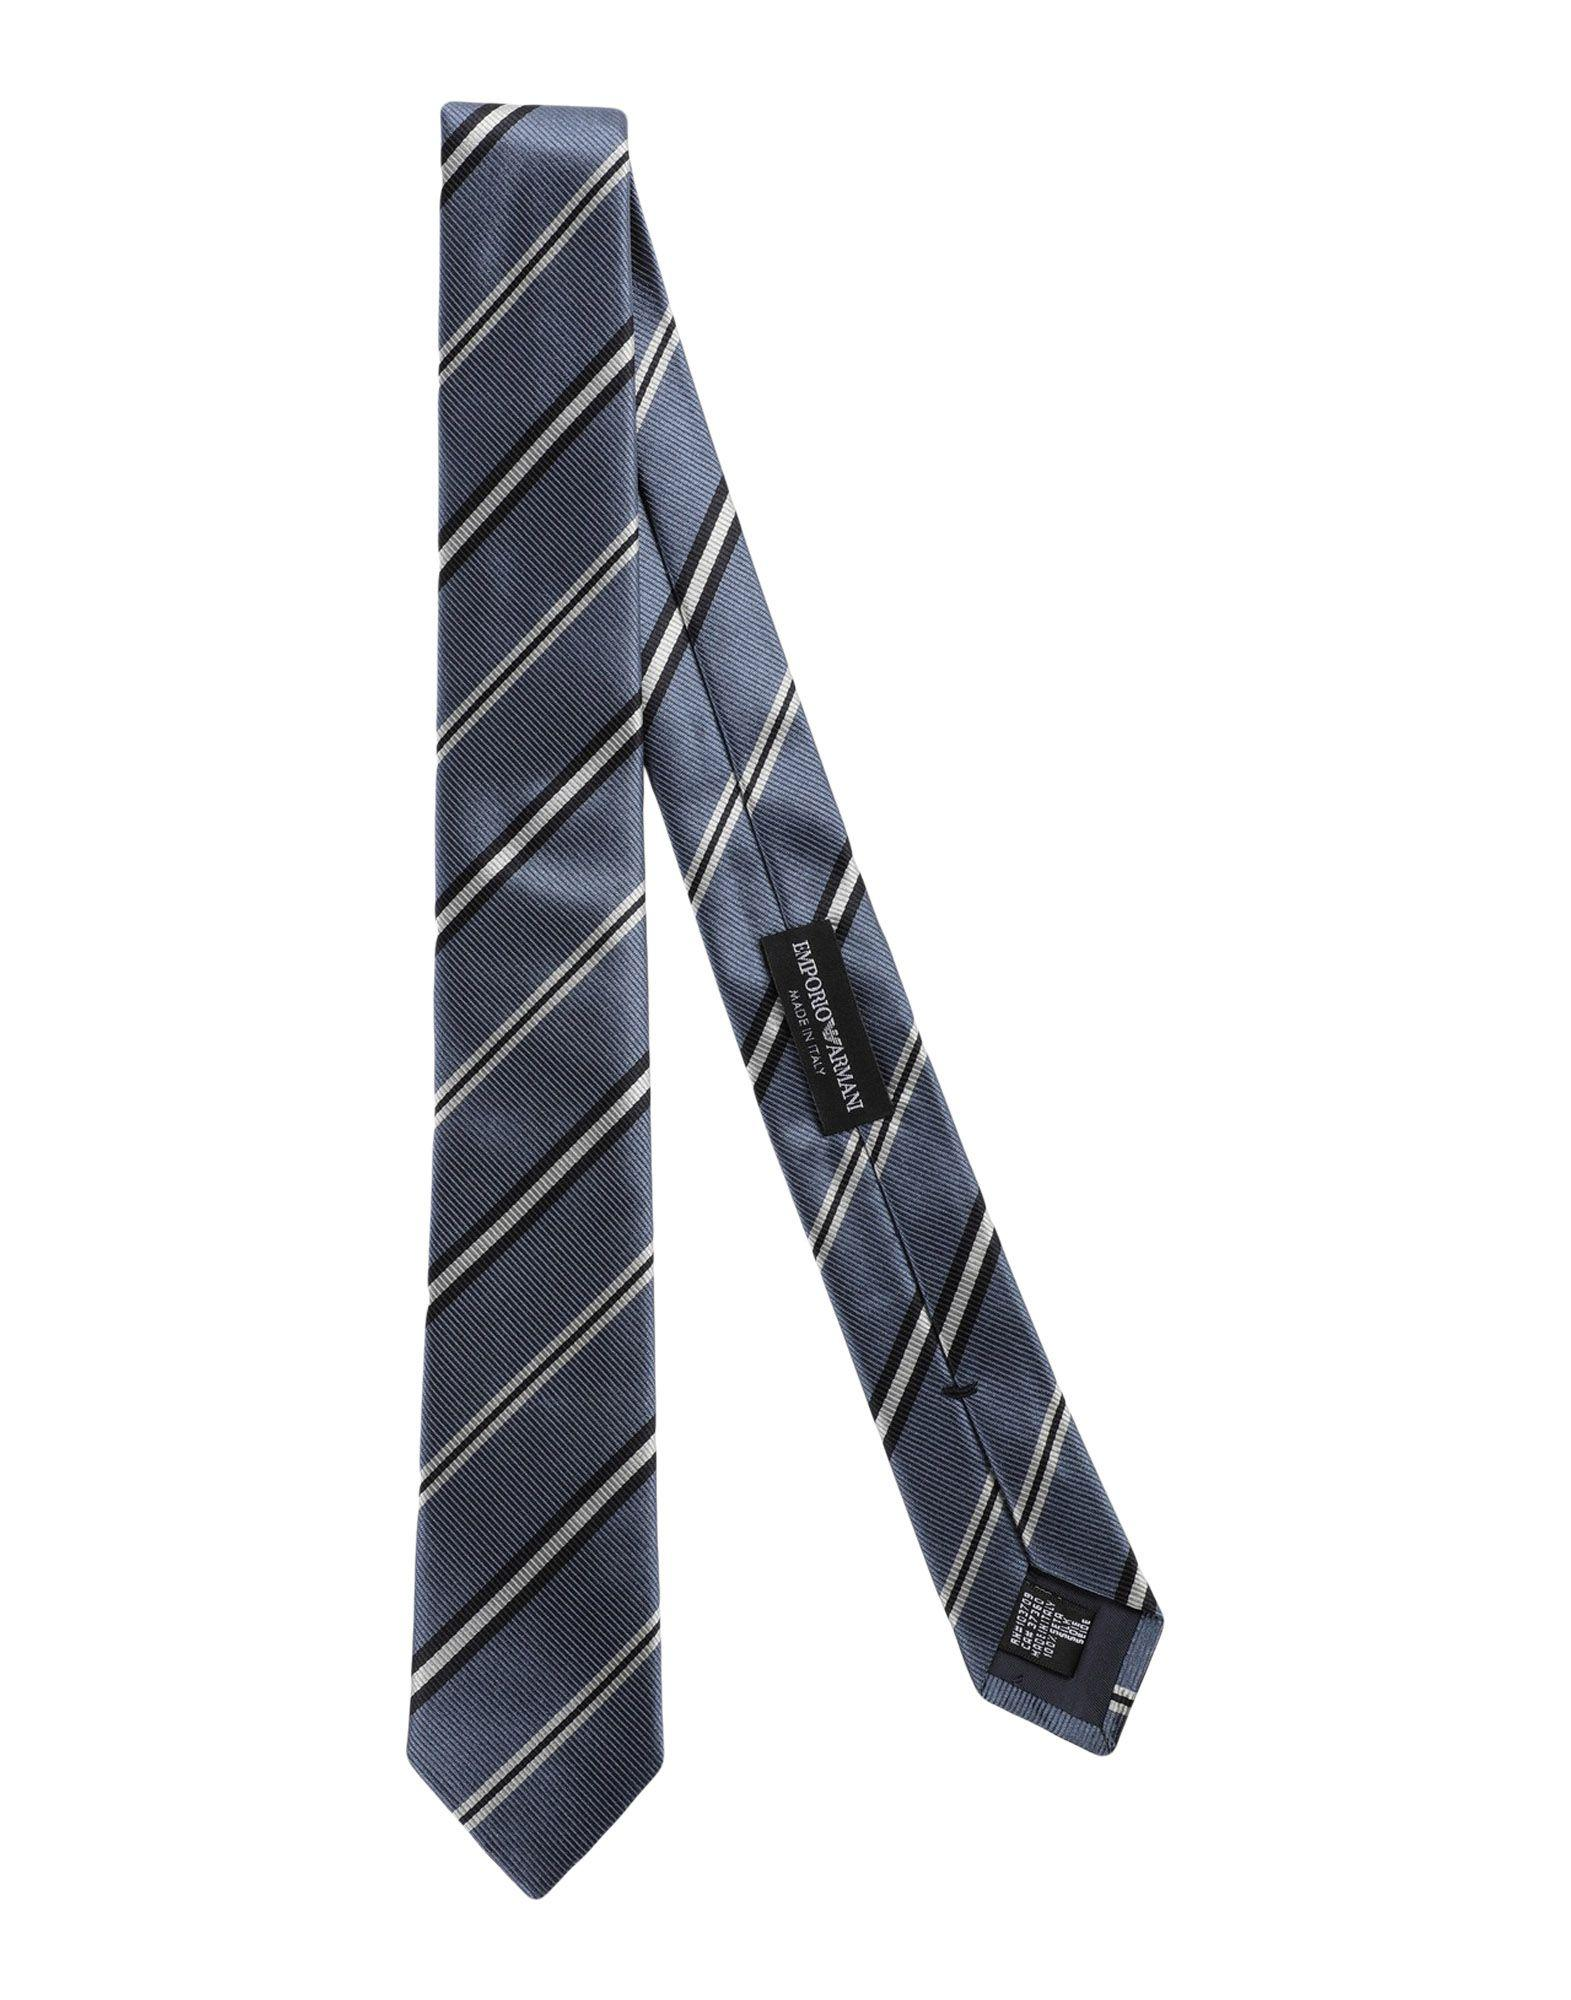 Emporio Armani Tie In Blue